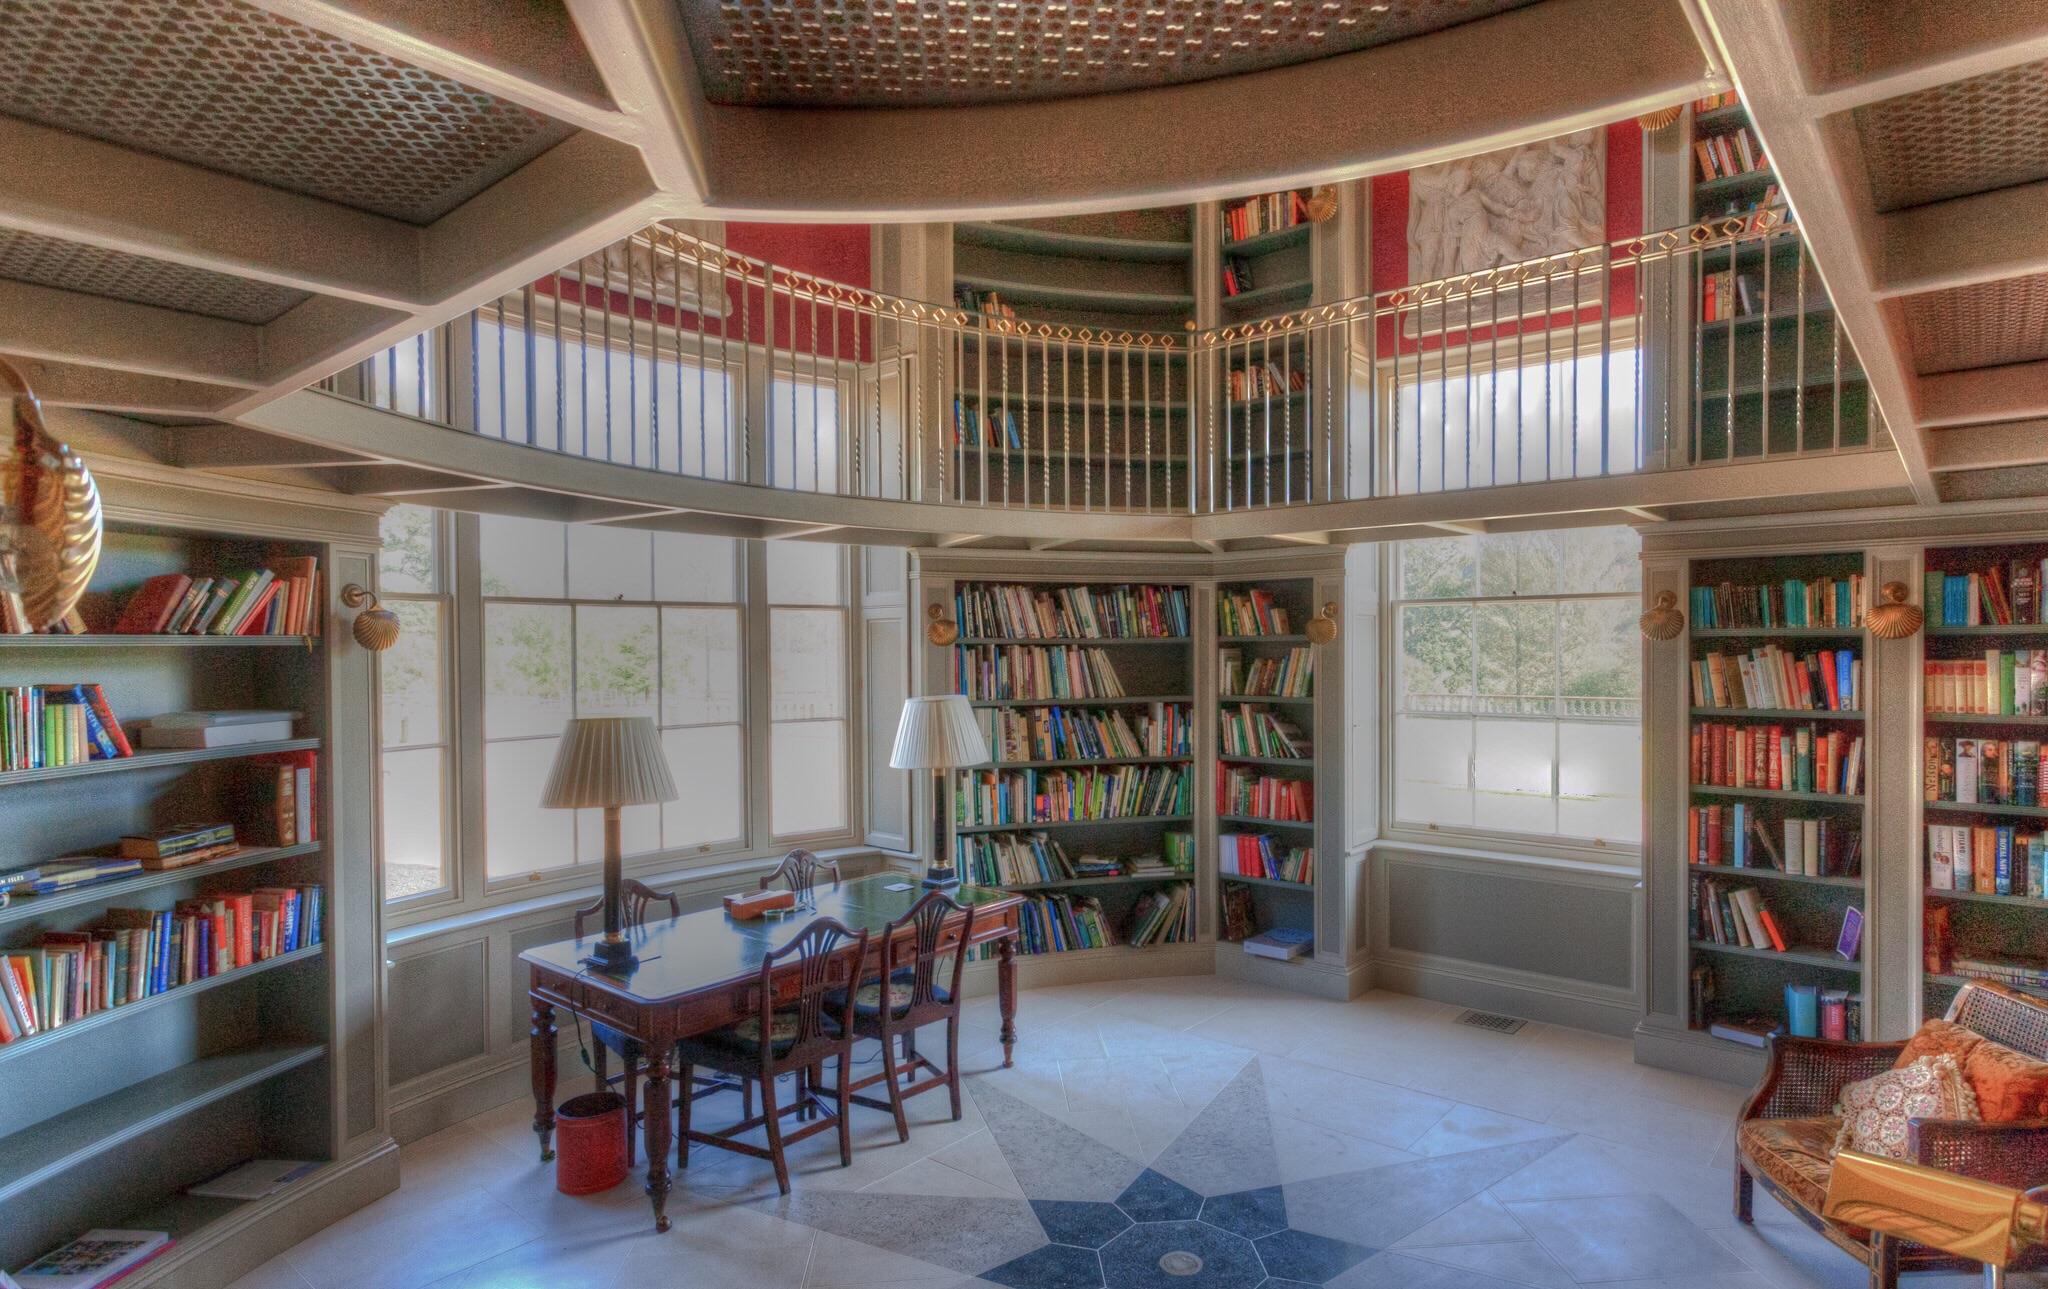 Library, Dorset, by interior photographer Rick McEvoy